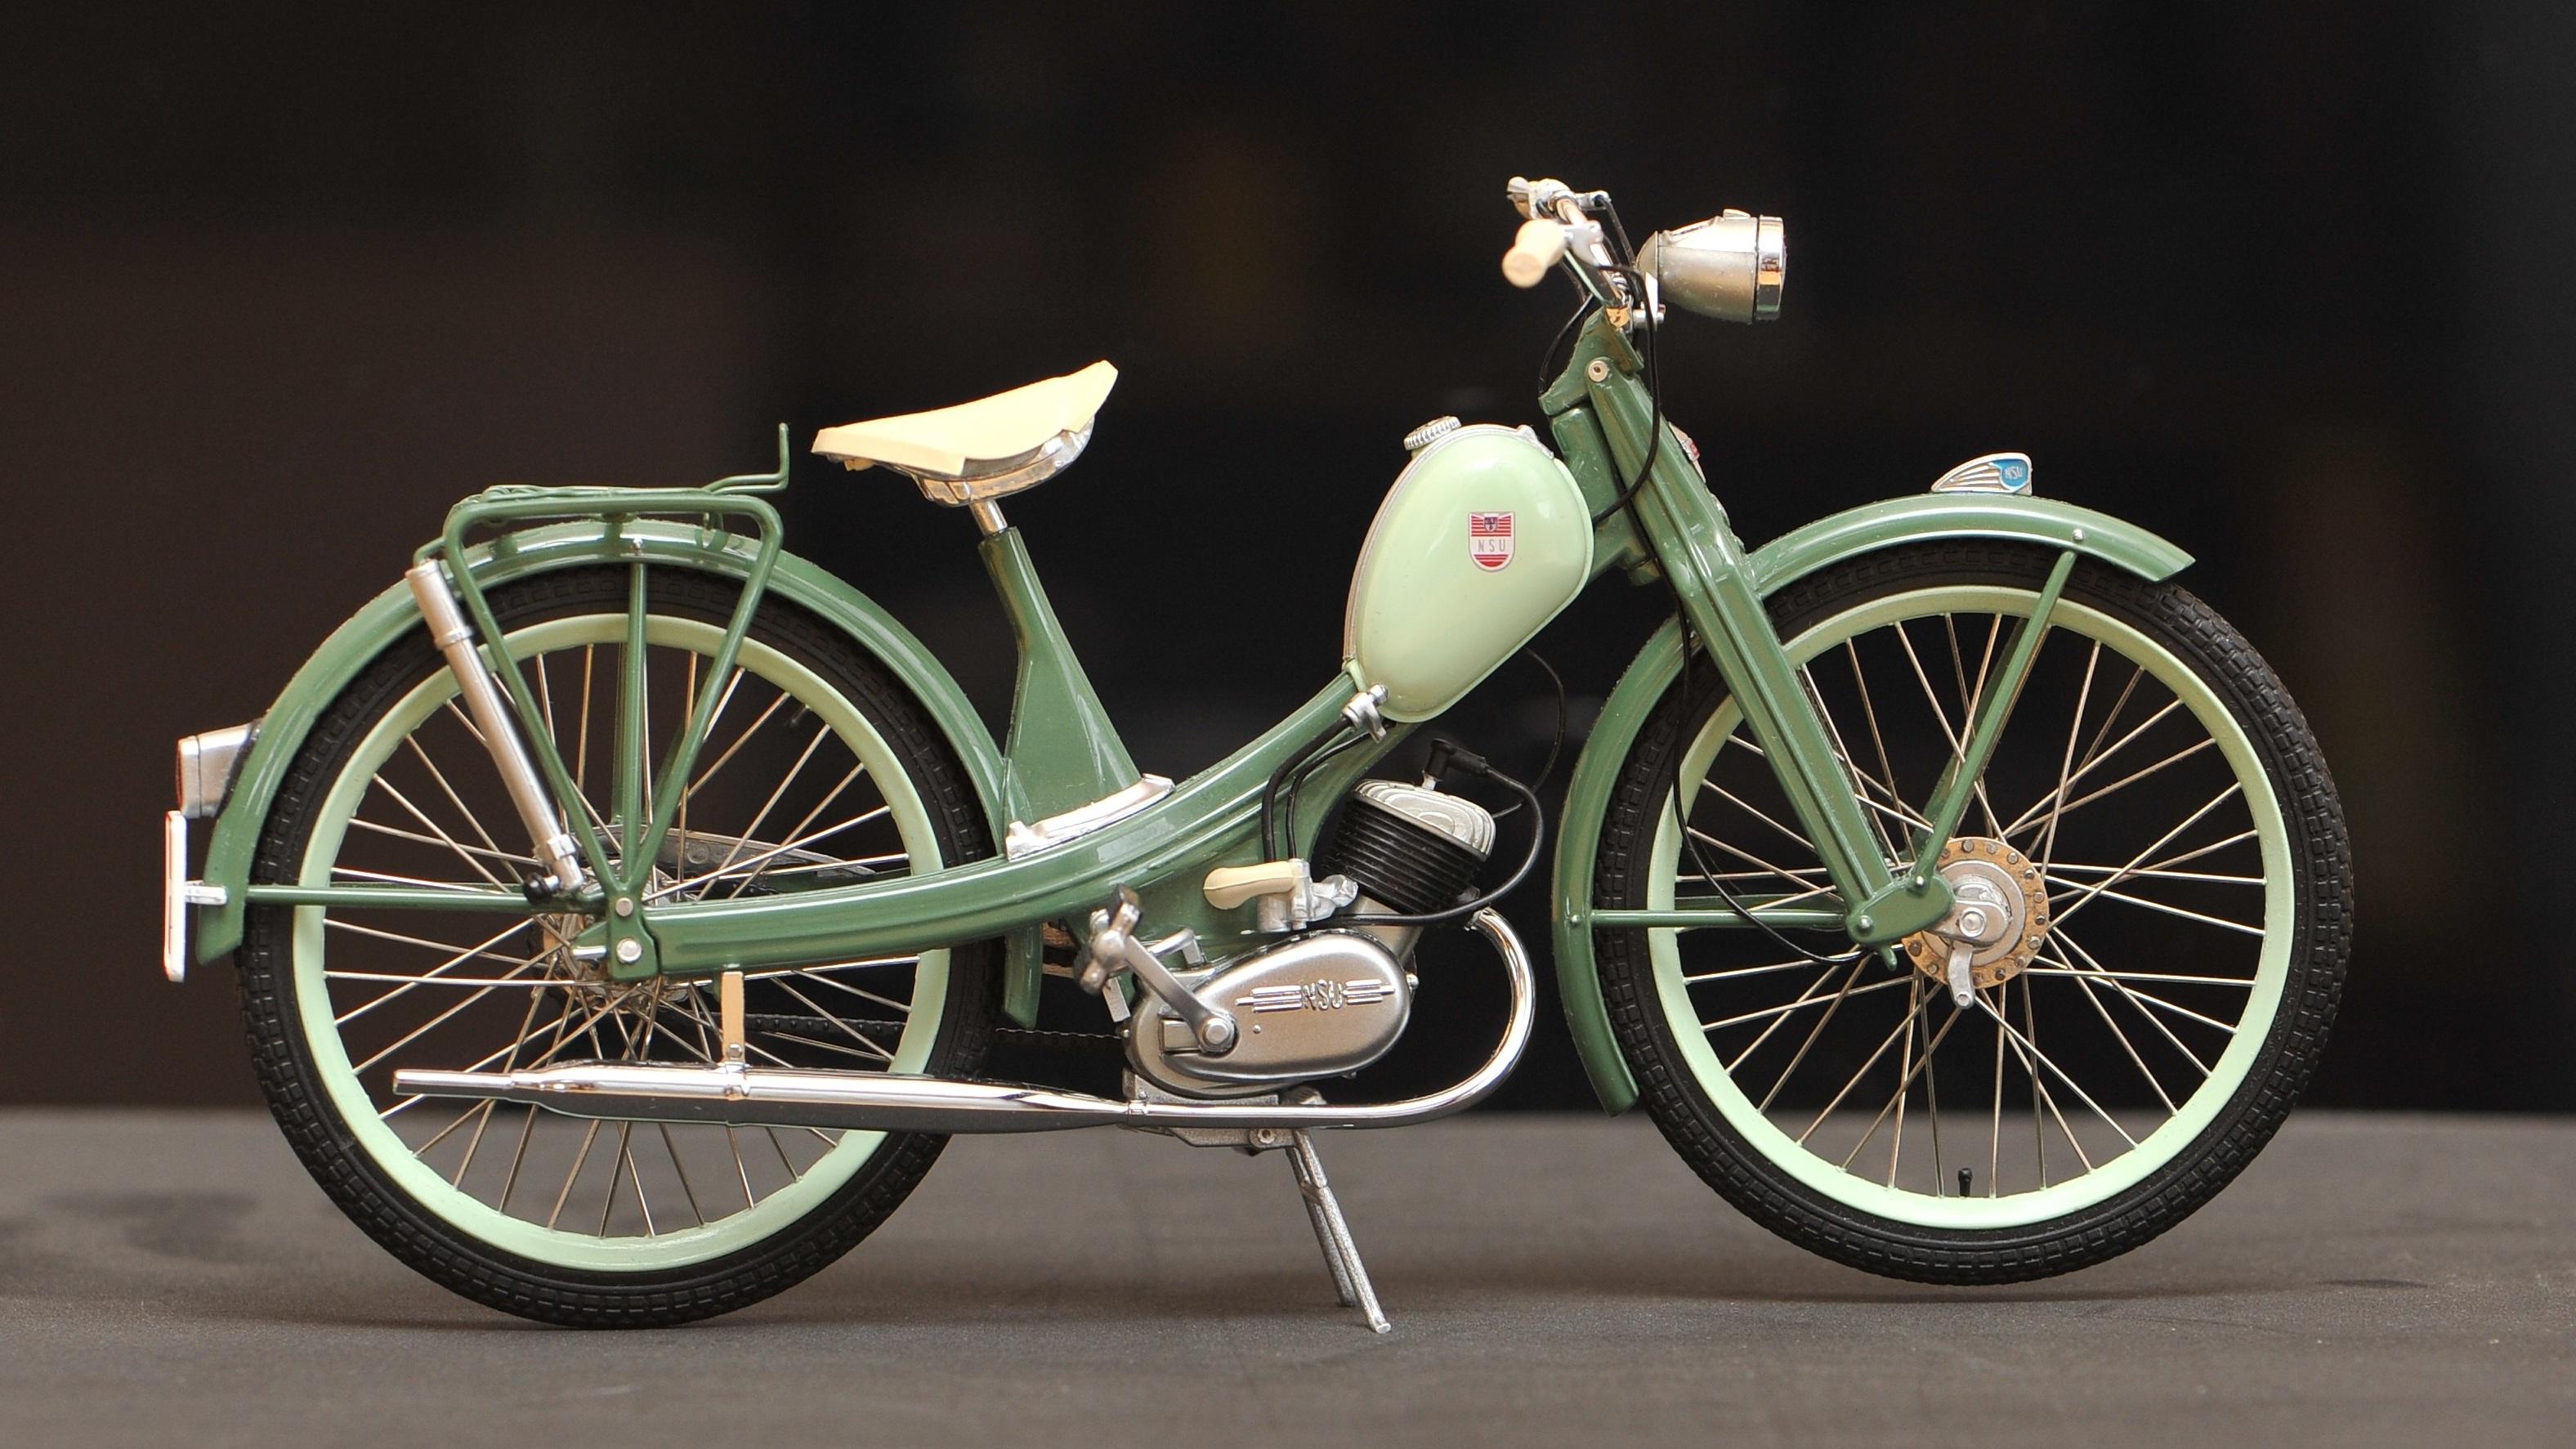 kostenlose foto auto rad fahrrad modell fahrzeug. Black Bedroom Furniture Sets. Home Design Ideas